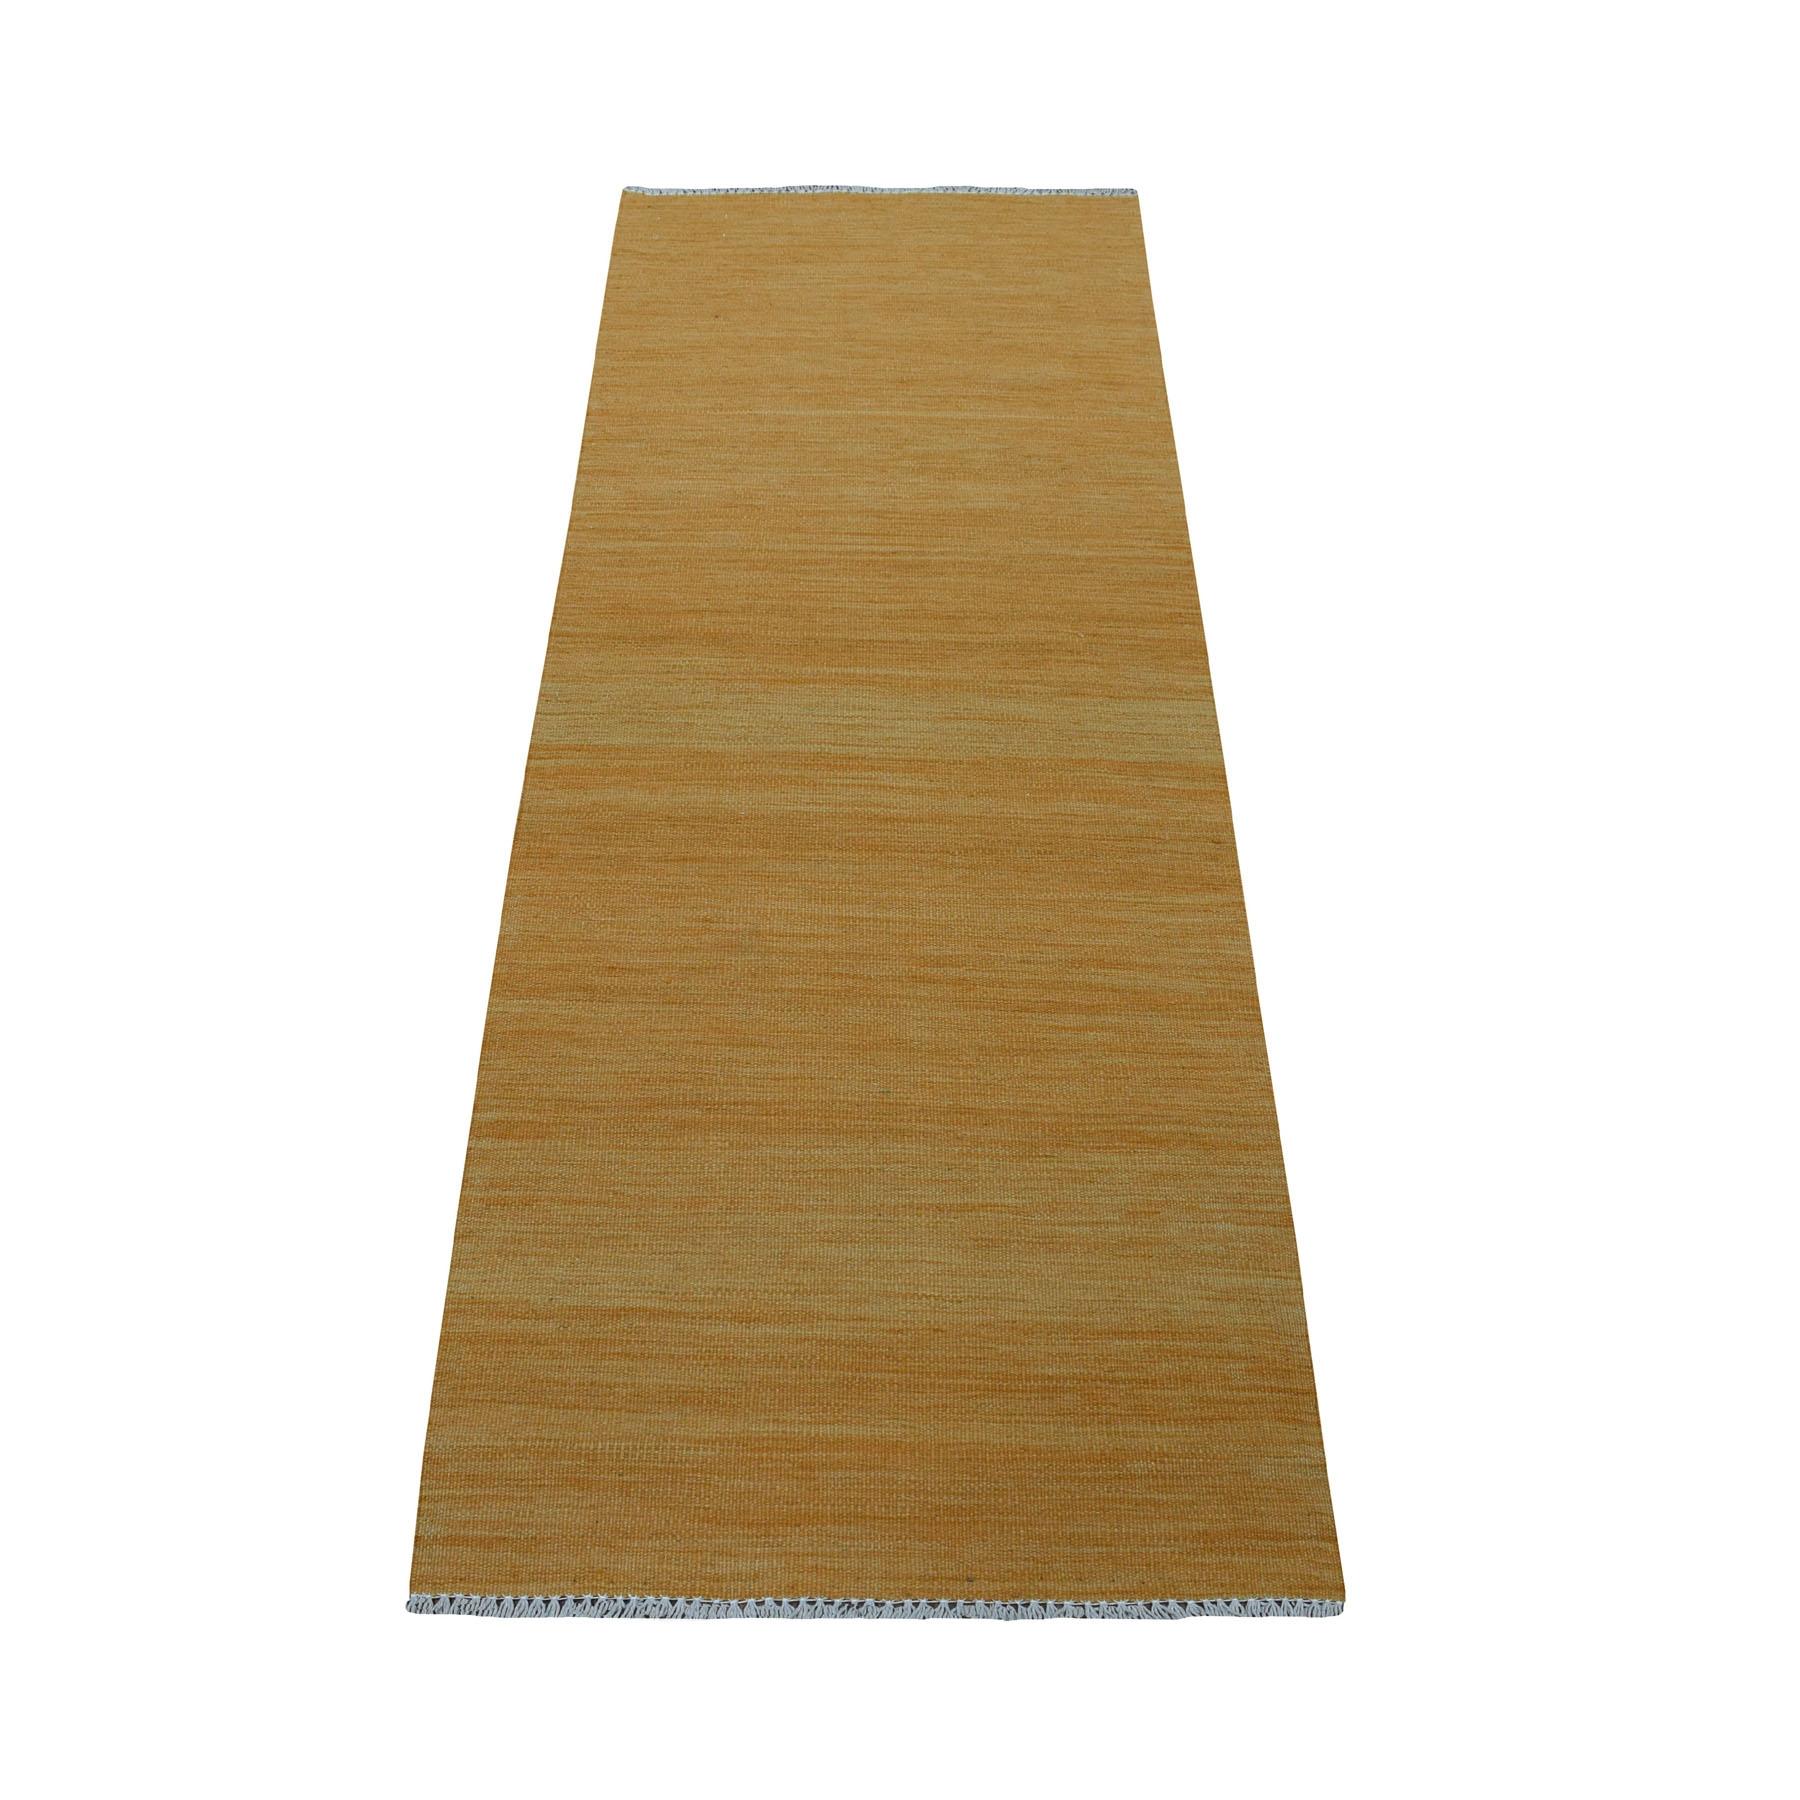 "2'3""X6'4"" Gold Shades Flat Weave Kilim Pure Wool Hand Woven Runner Oriental Rug moaec8e9"